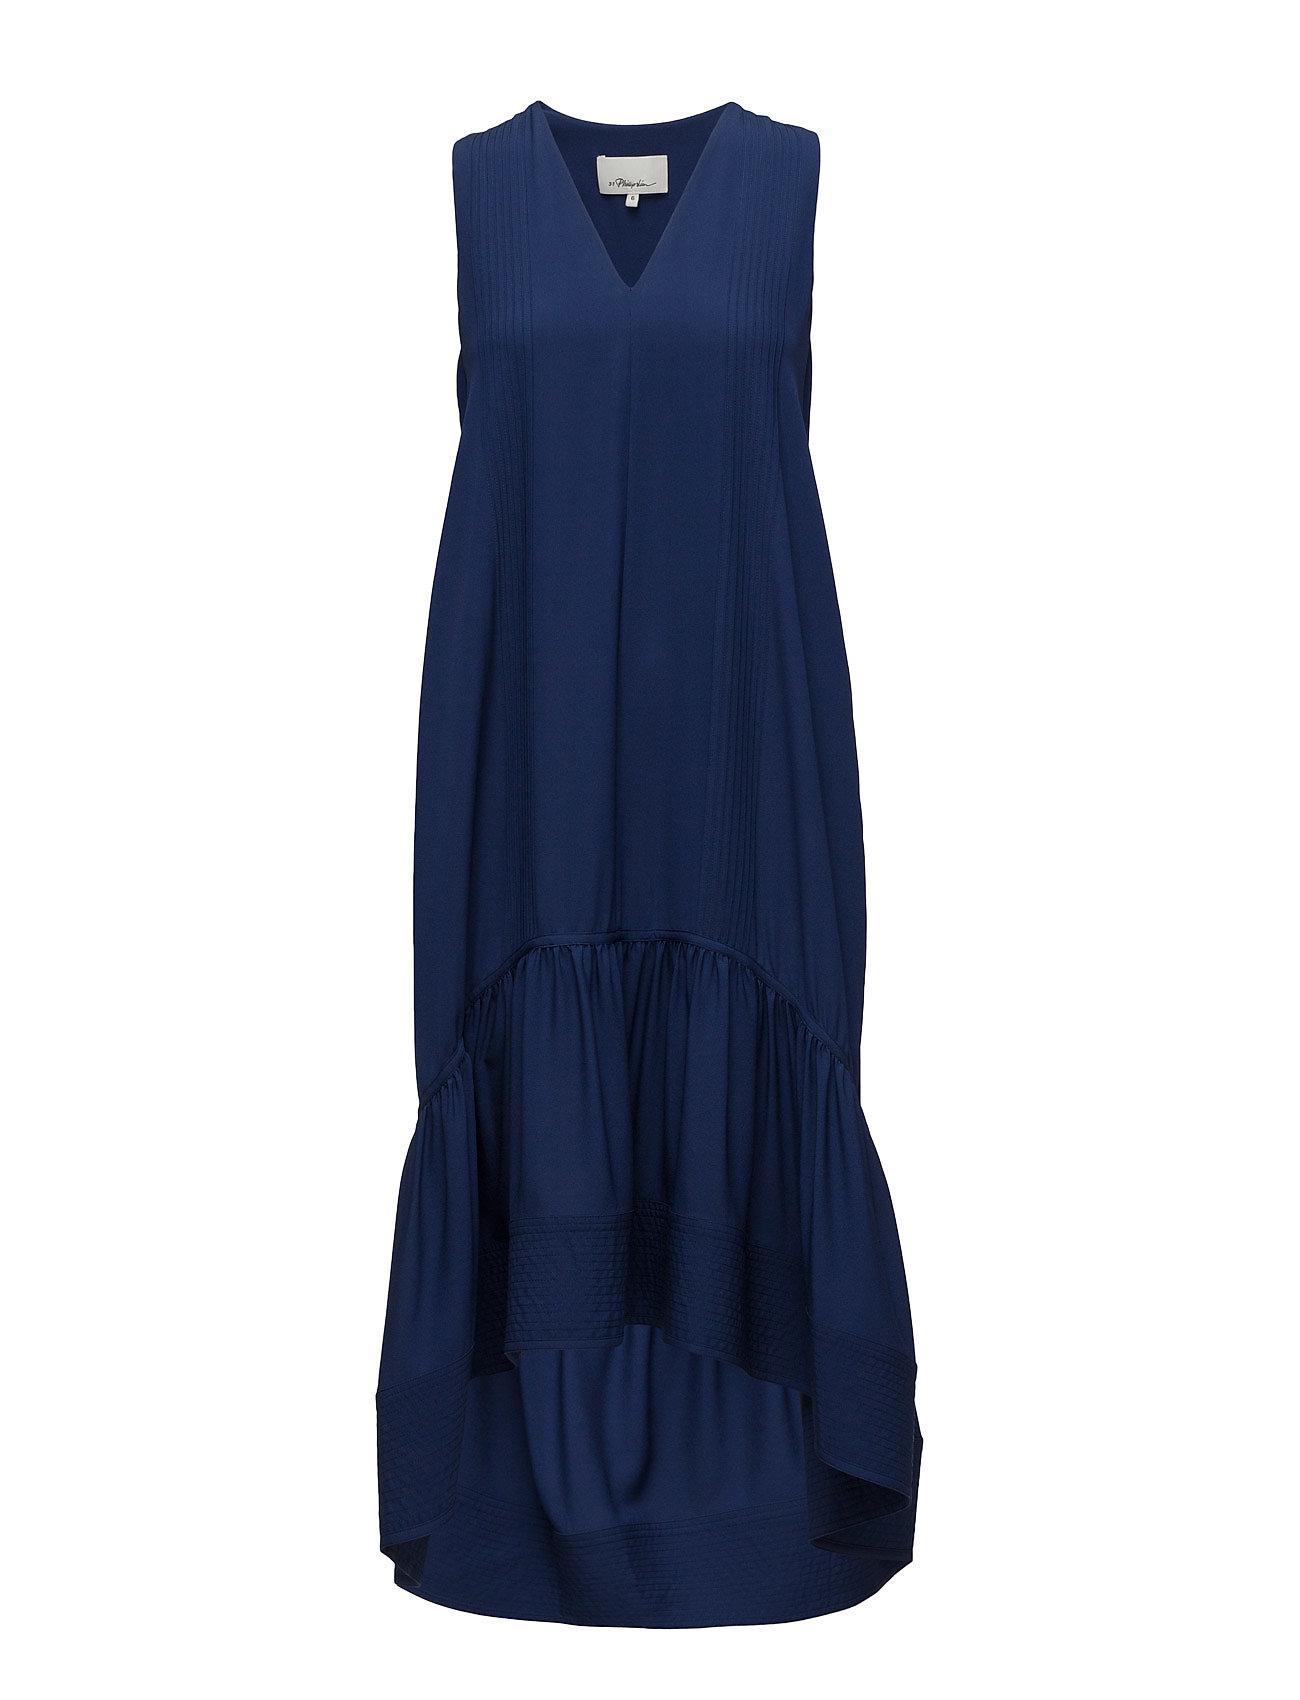 Sl dress w stitch detail at hem fra 3.1 phillip lim fra boozt.com dk